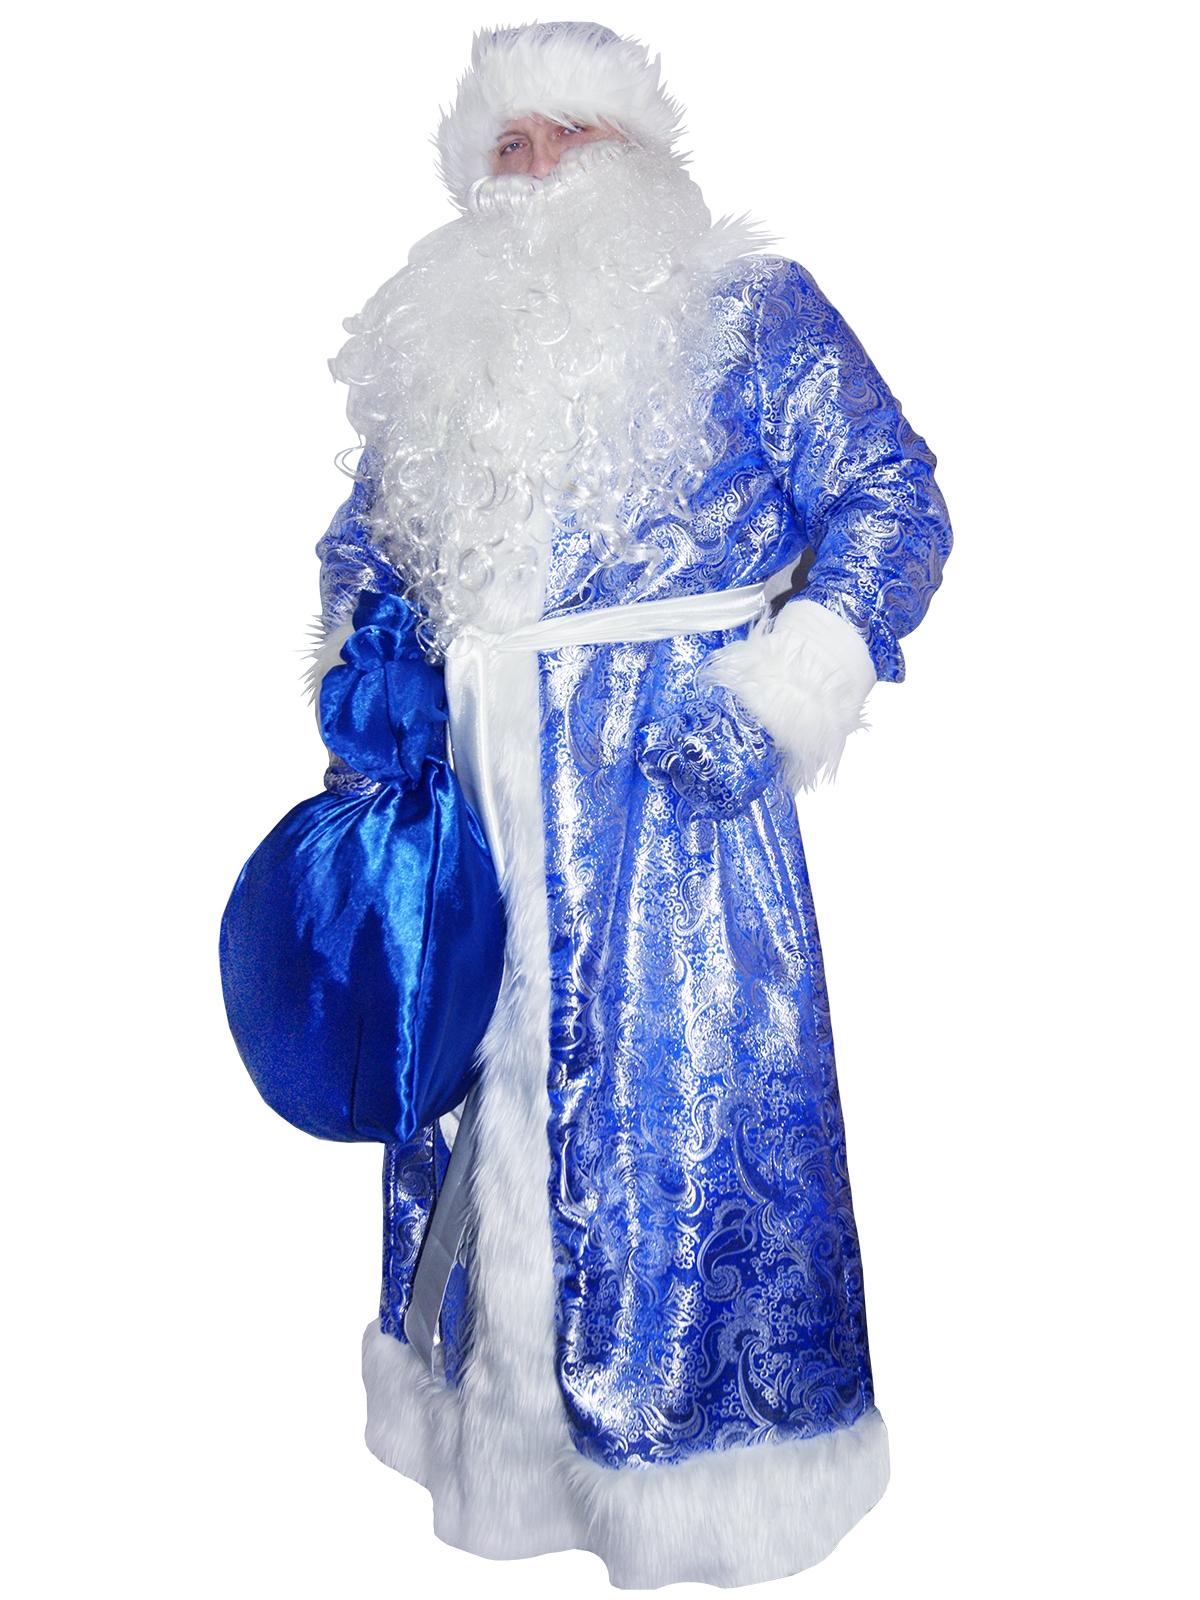 Костюм сказочного Дедушки Мороза (50-52) шубы